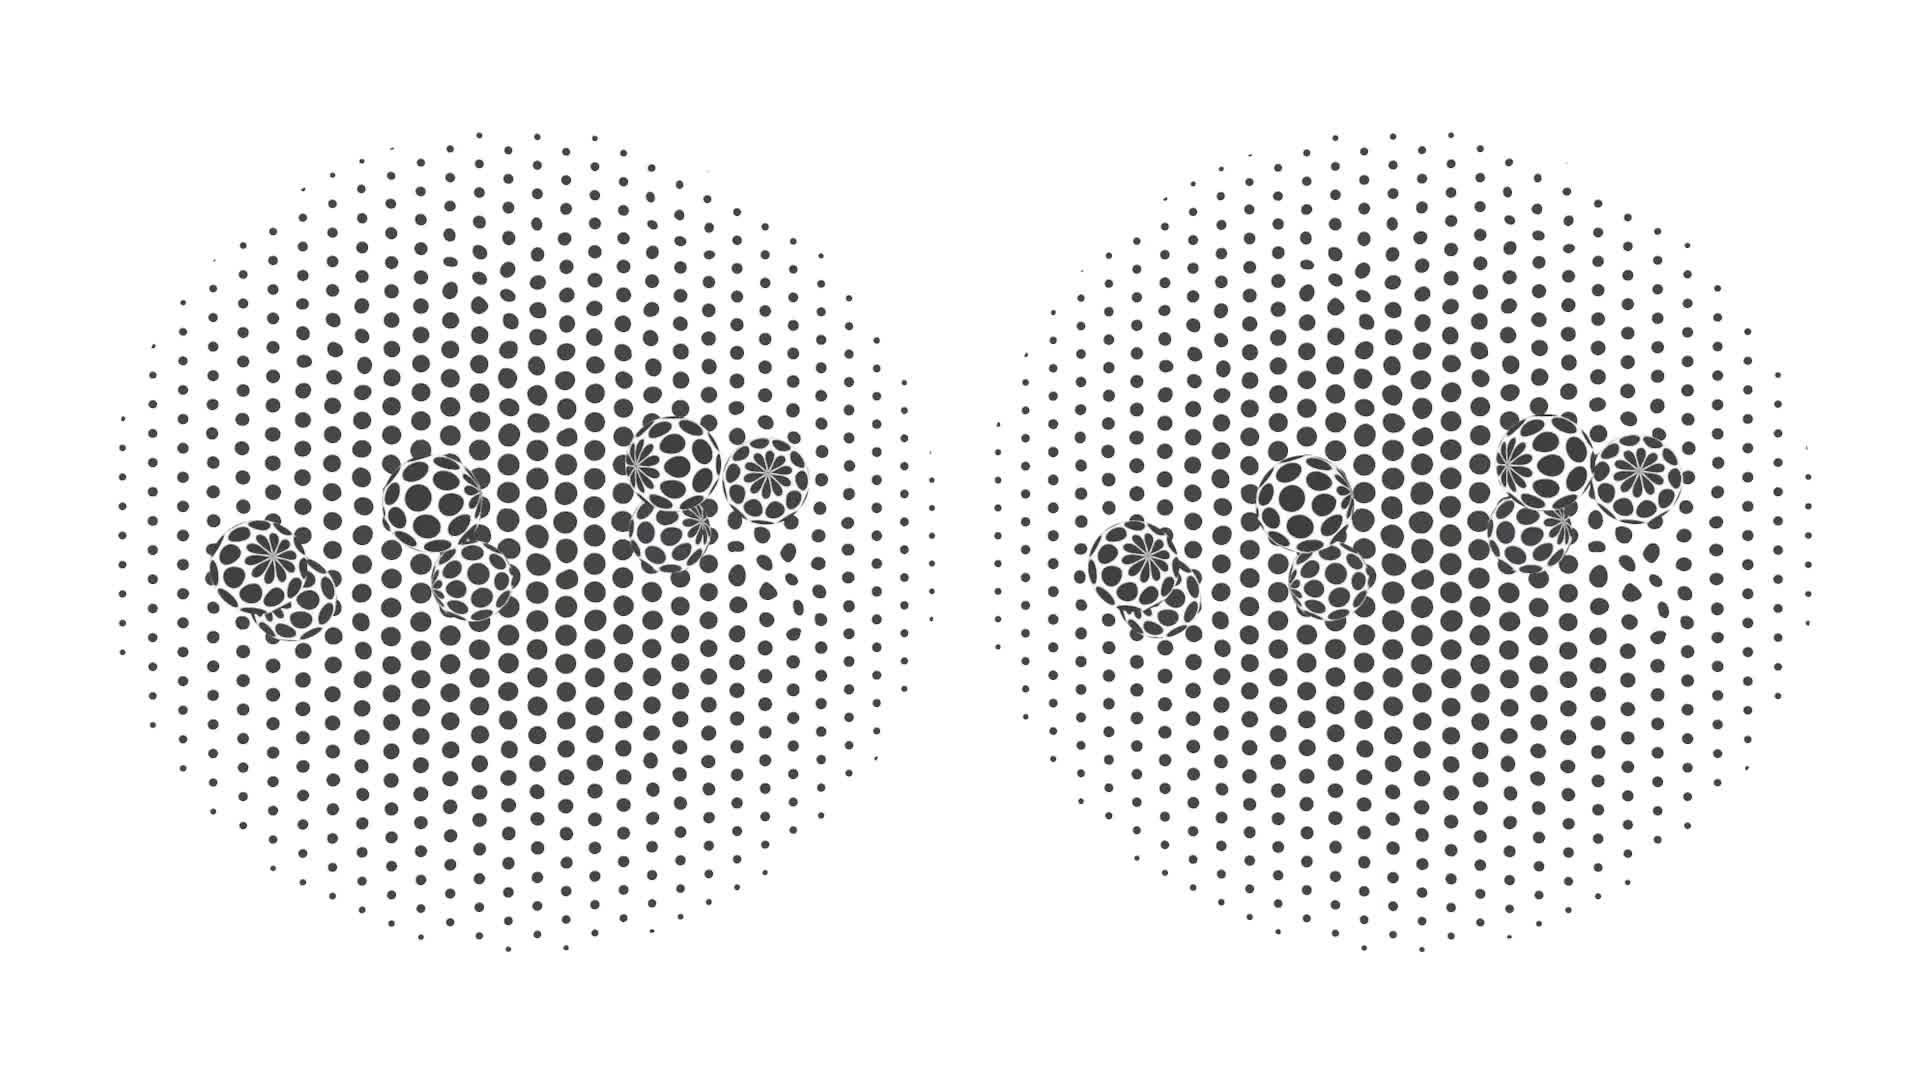 3d, HdenebH, animation, crosseye, crosseye3d, crosseyed, crossview, looping, stereoscopic, Stereoscopic 3d animation - crossview GIFs